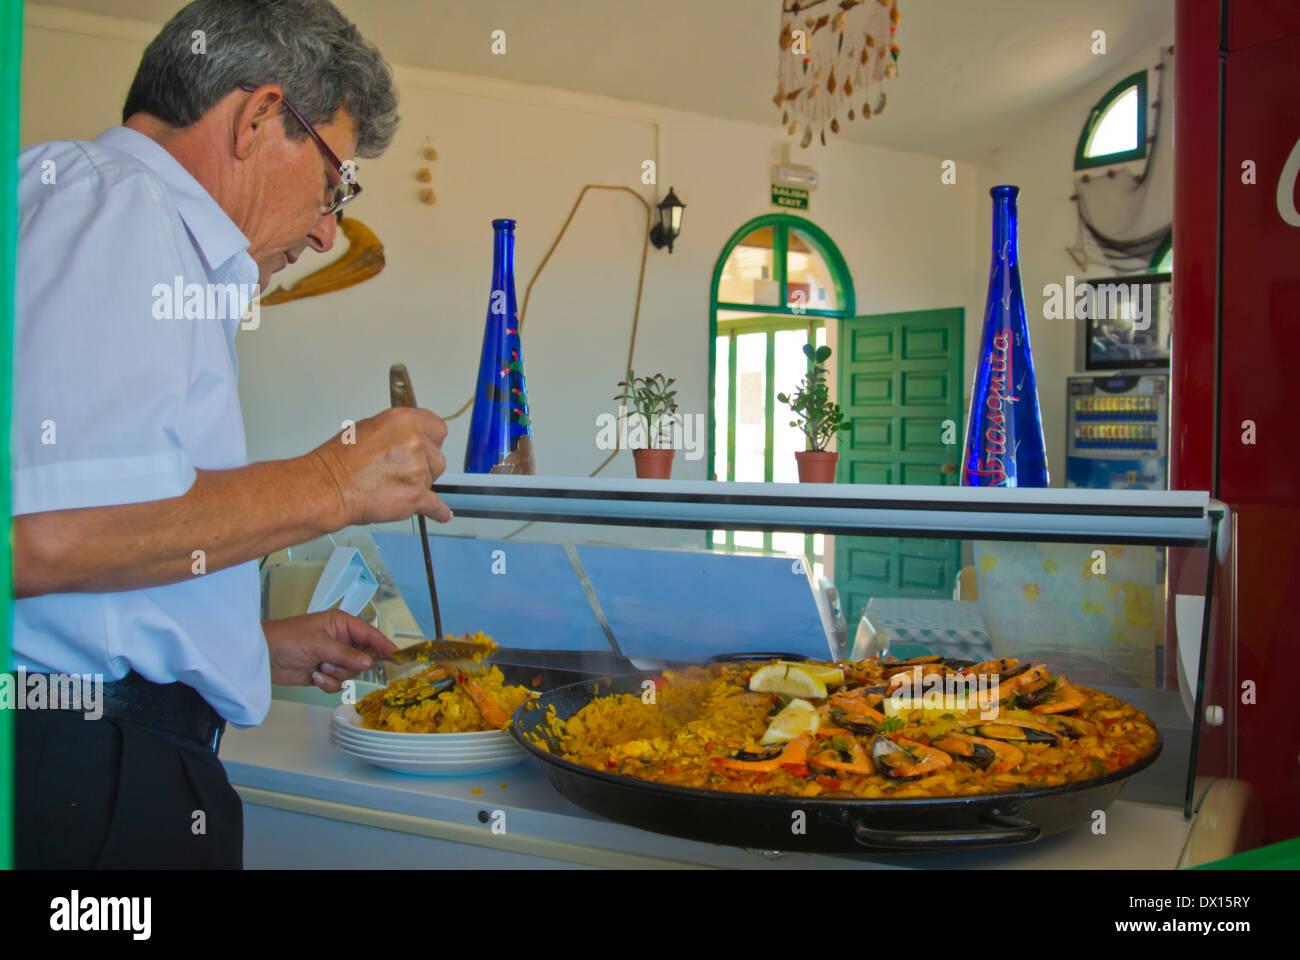 Onn Mercredi Frasquita a restaurant de fruits de mer paella aux fruits de mer, Caleta de Fuste, Fuerteventura, Canary Islands, Spain, Europe Photo Stock